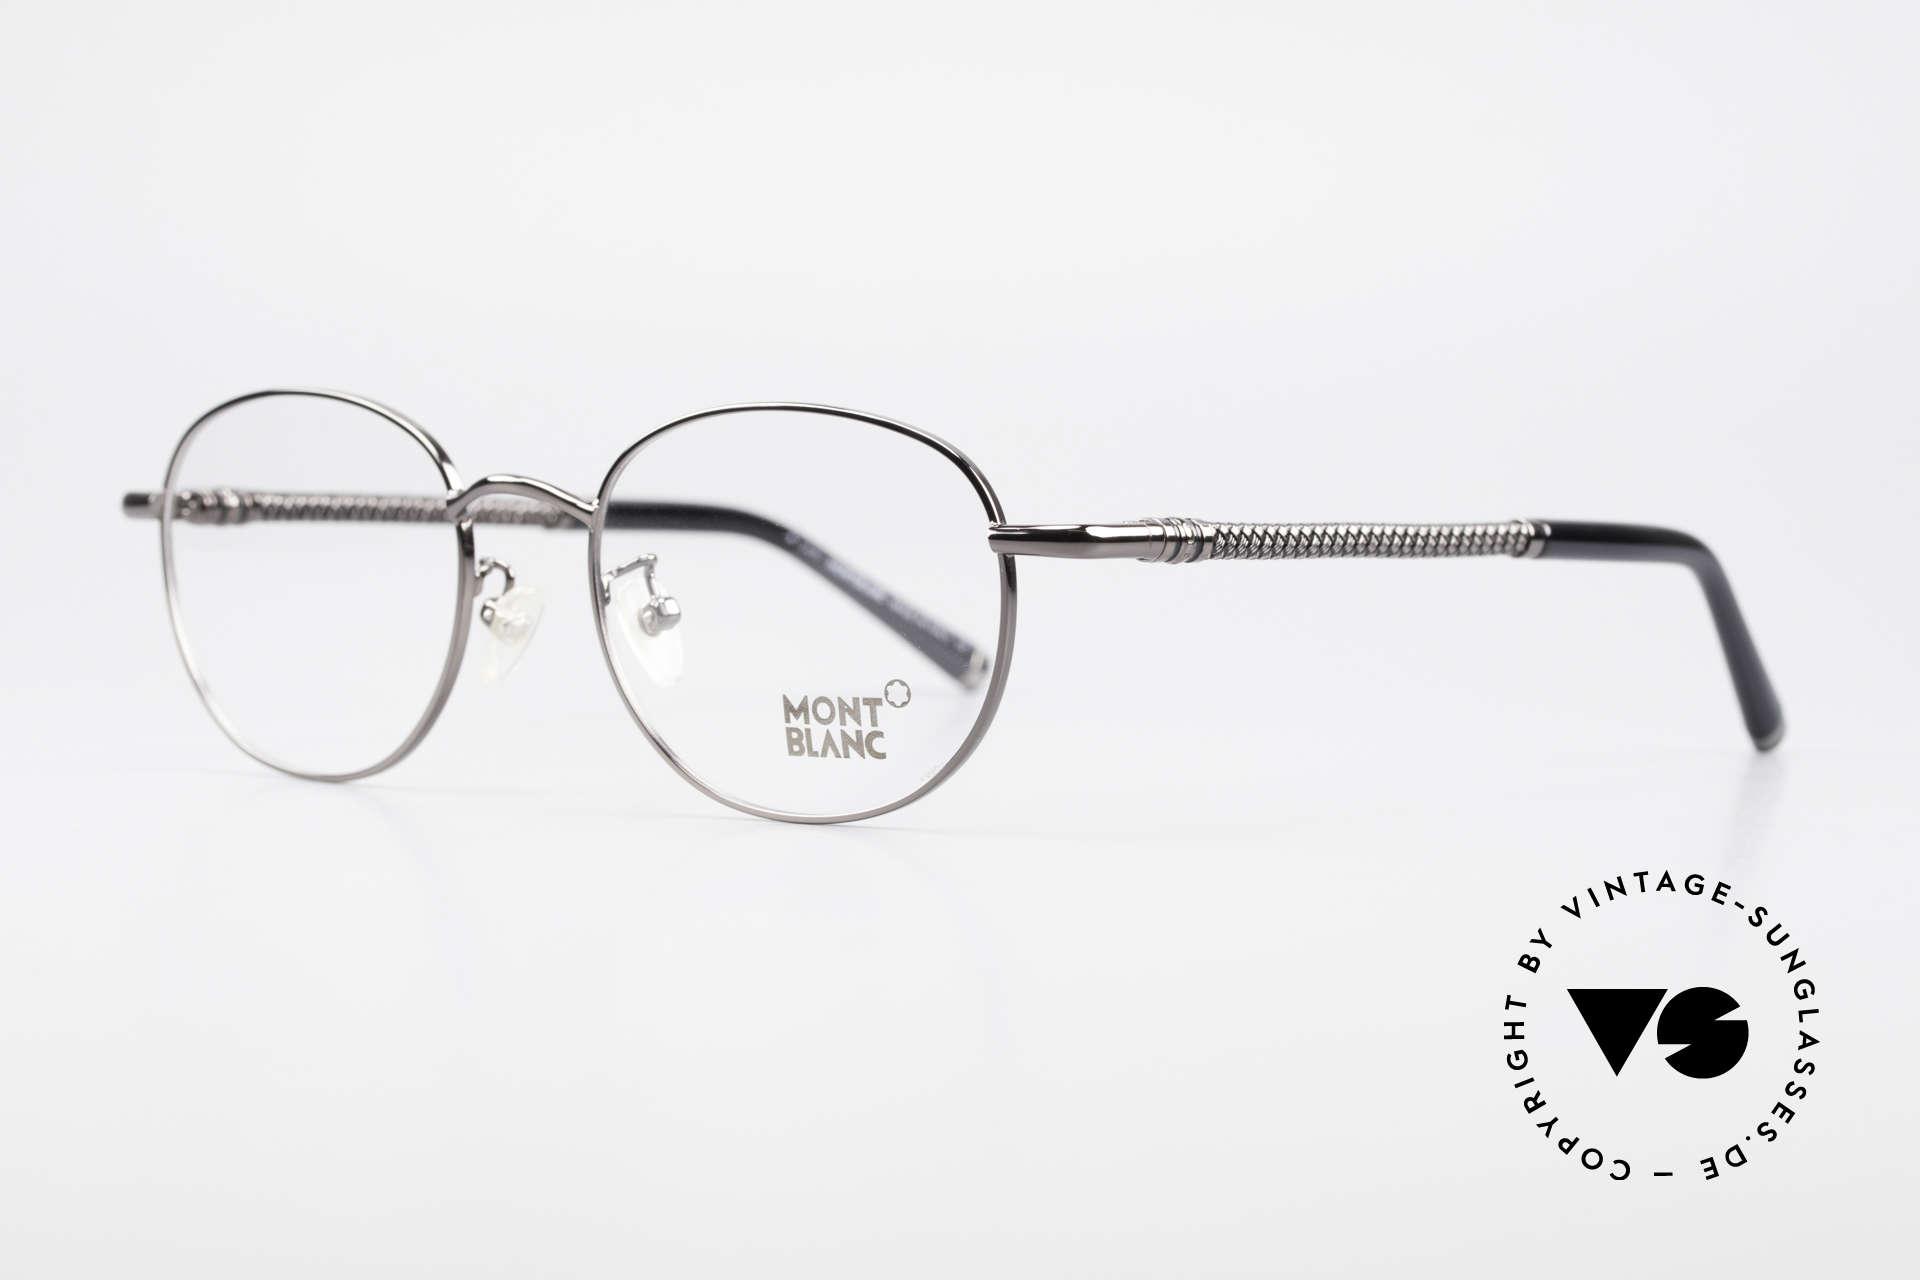 Montblanc MB392 Luxury Panto Frame Gunmetal, metal frame with gunmetal finish (shiny anthracite), Made for Men and Women